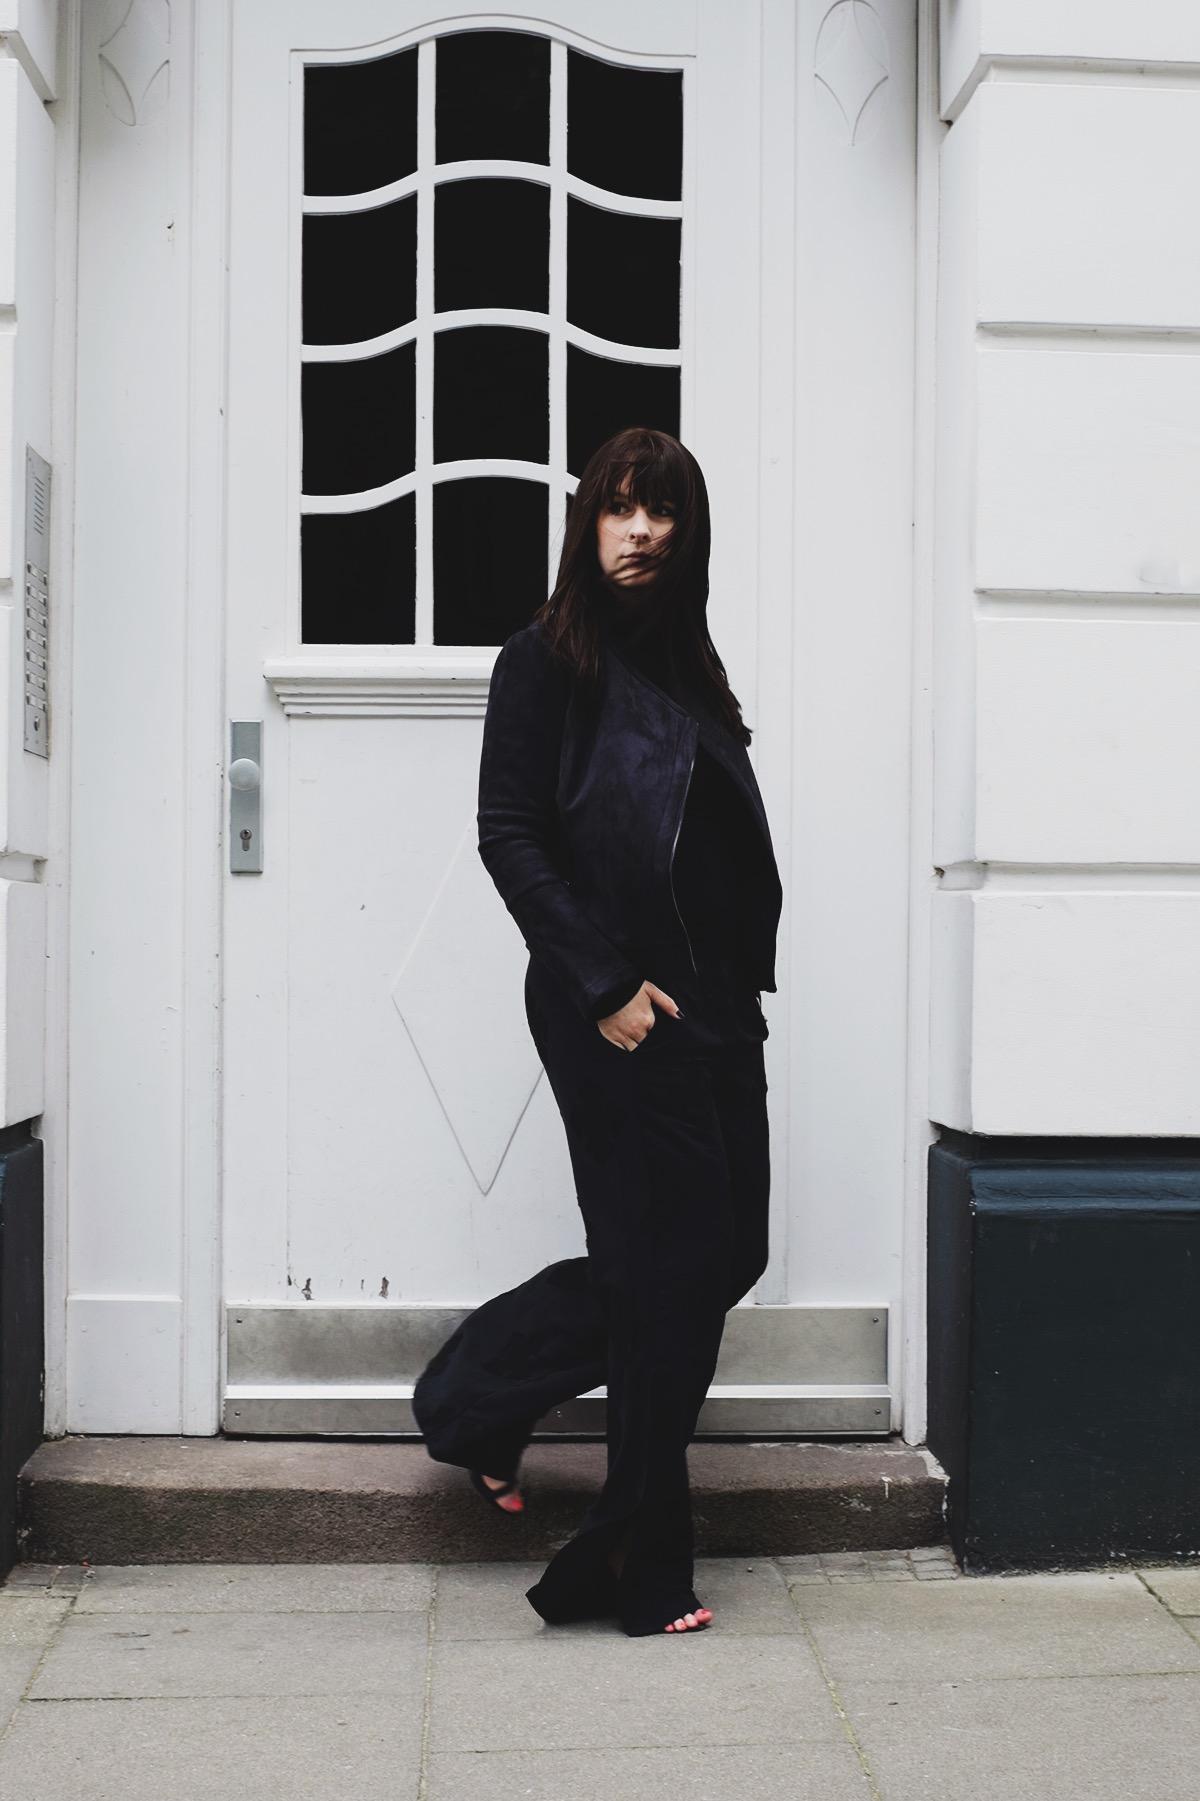 anna frost fashionblogger hamburg fafine all black outfit